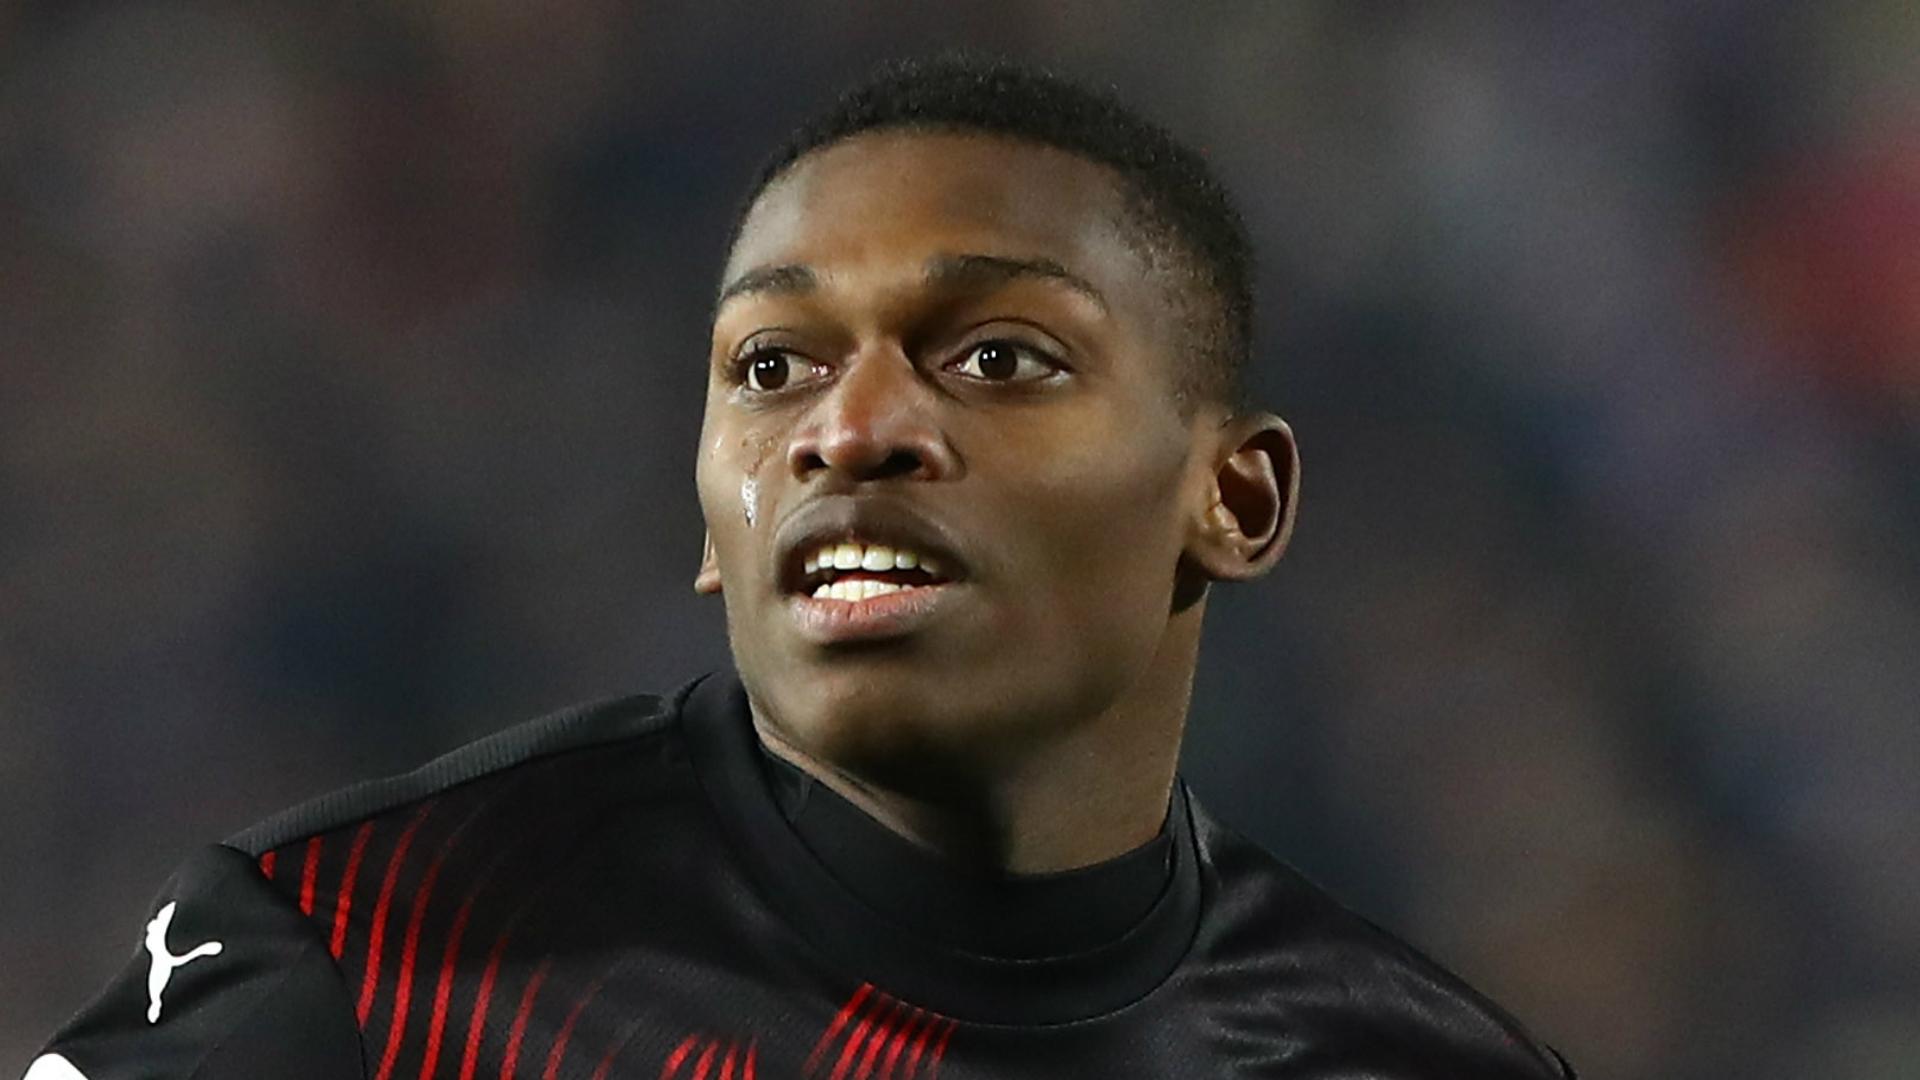 SPAL 2-2 Milan: Rossoneri seal dramatic late draw in Ibrahimovic's return